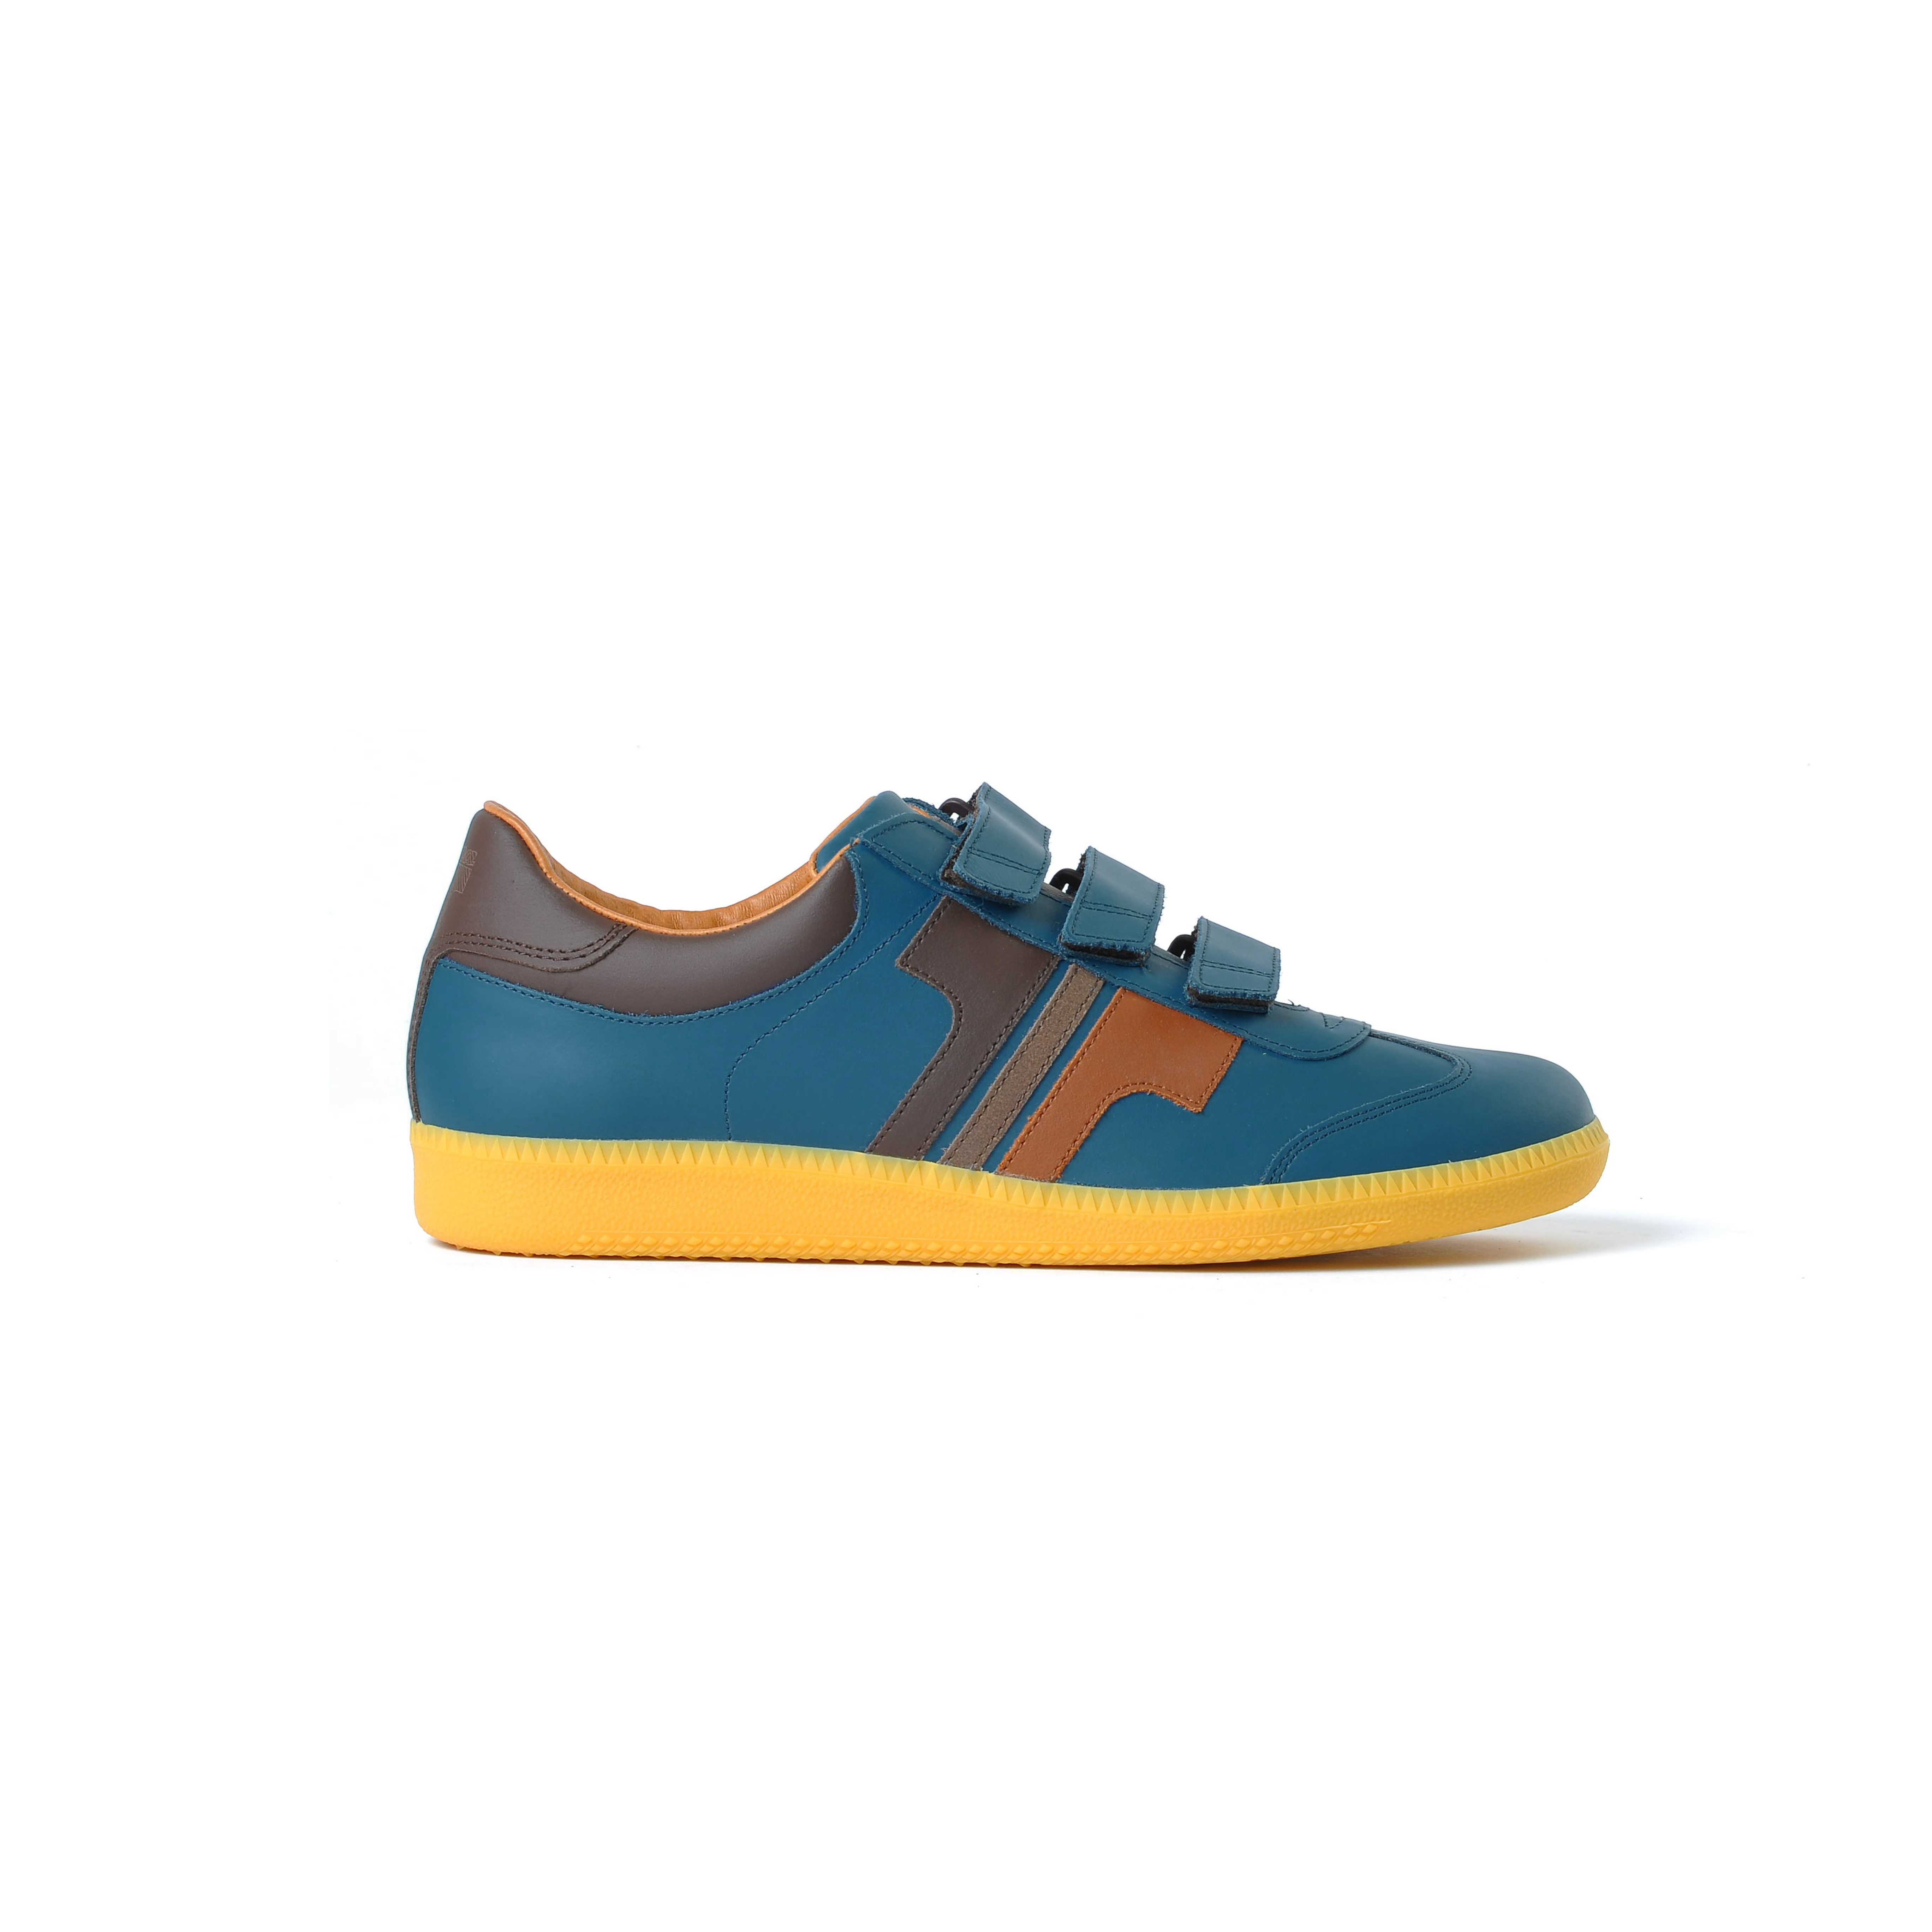 Tisza cipő - Compakt delux - Kék koral-3barna